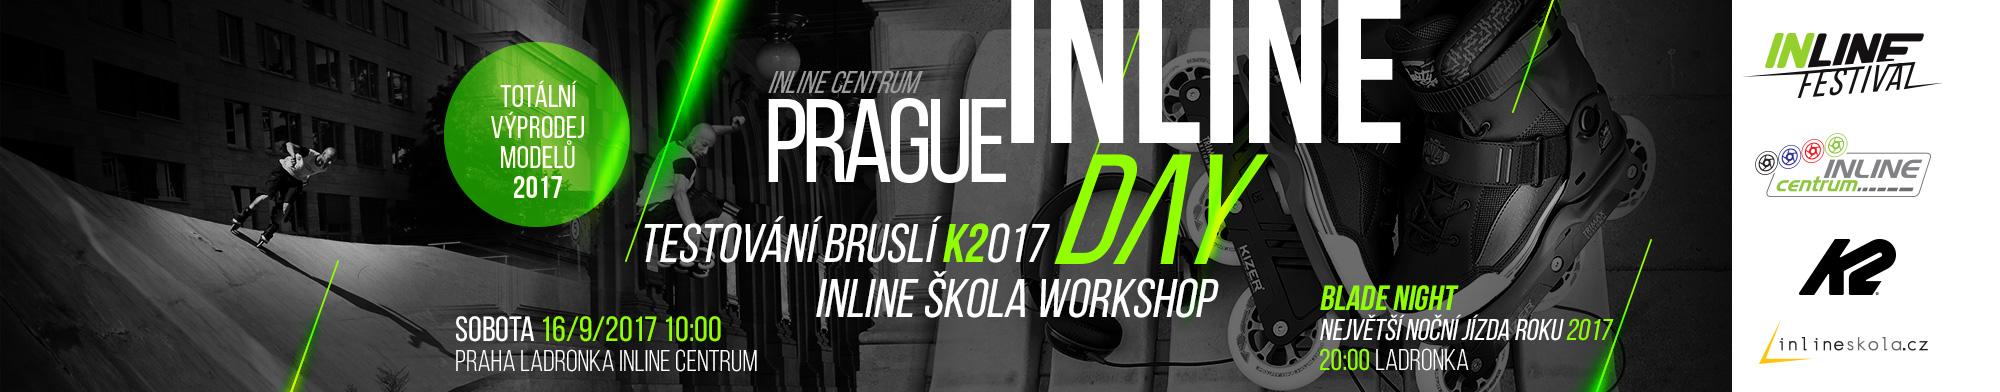 Inline Day 2017